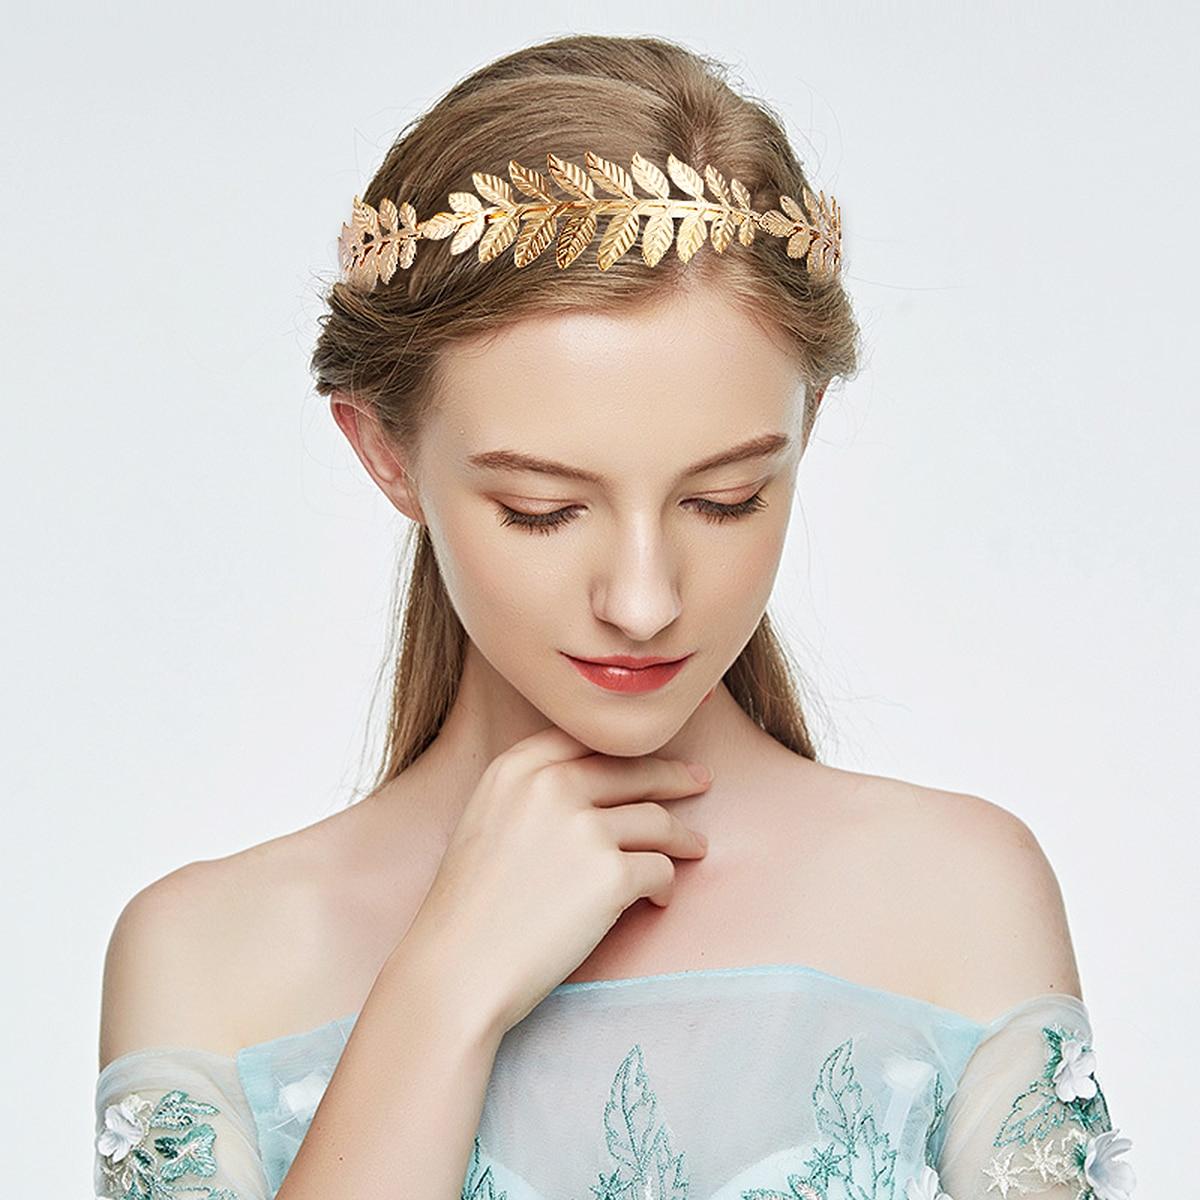 Alice Headband Boho Wedding Festival Floral Bride Crystal Her Curious Nature